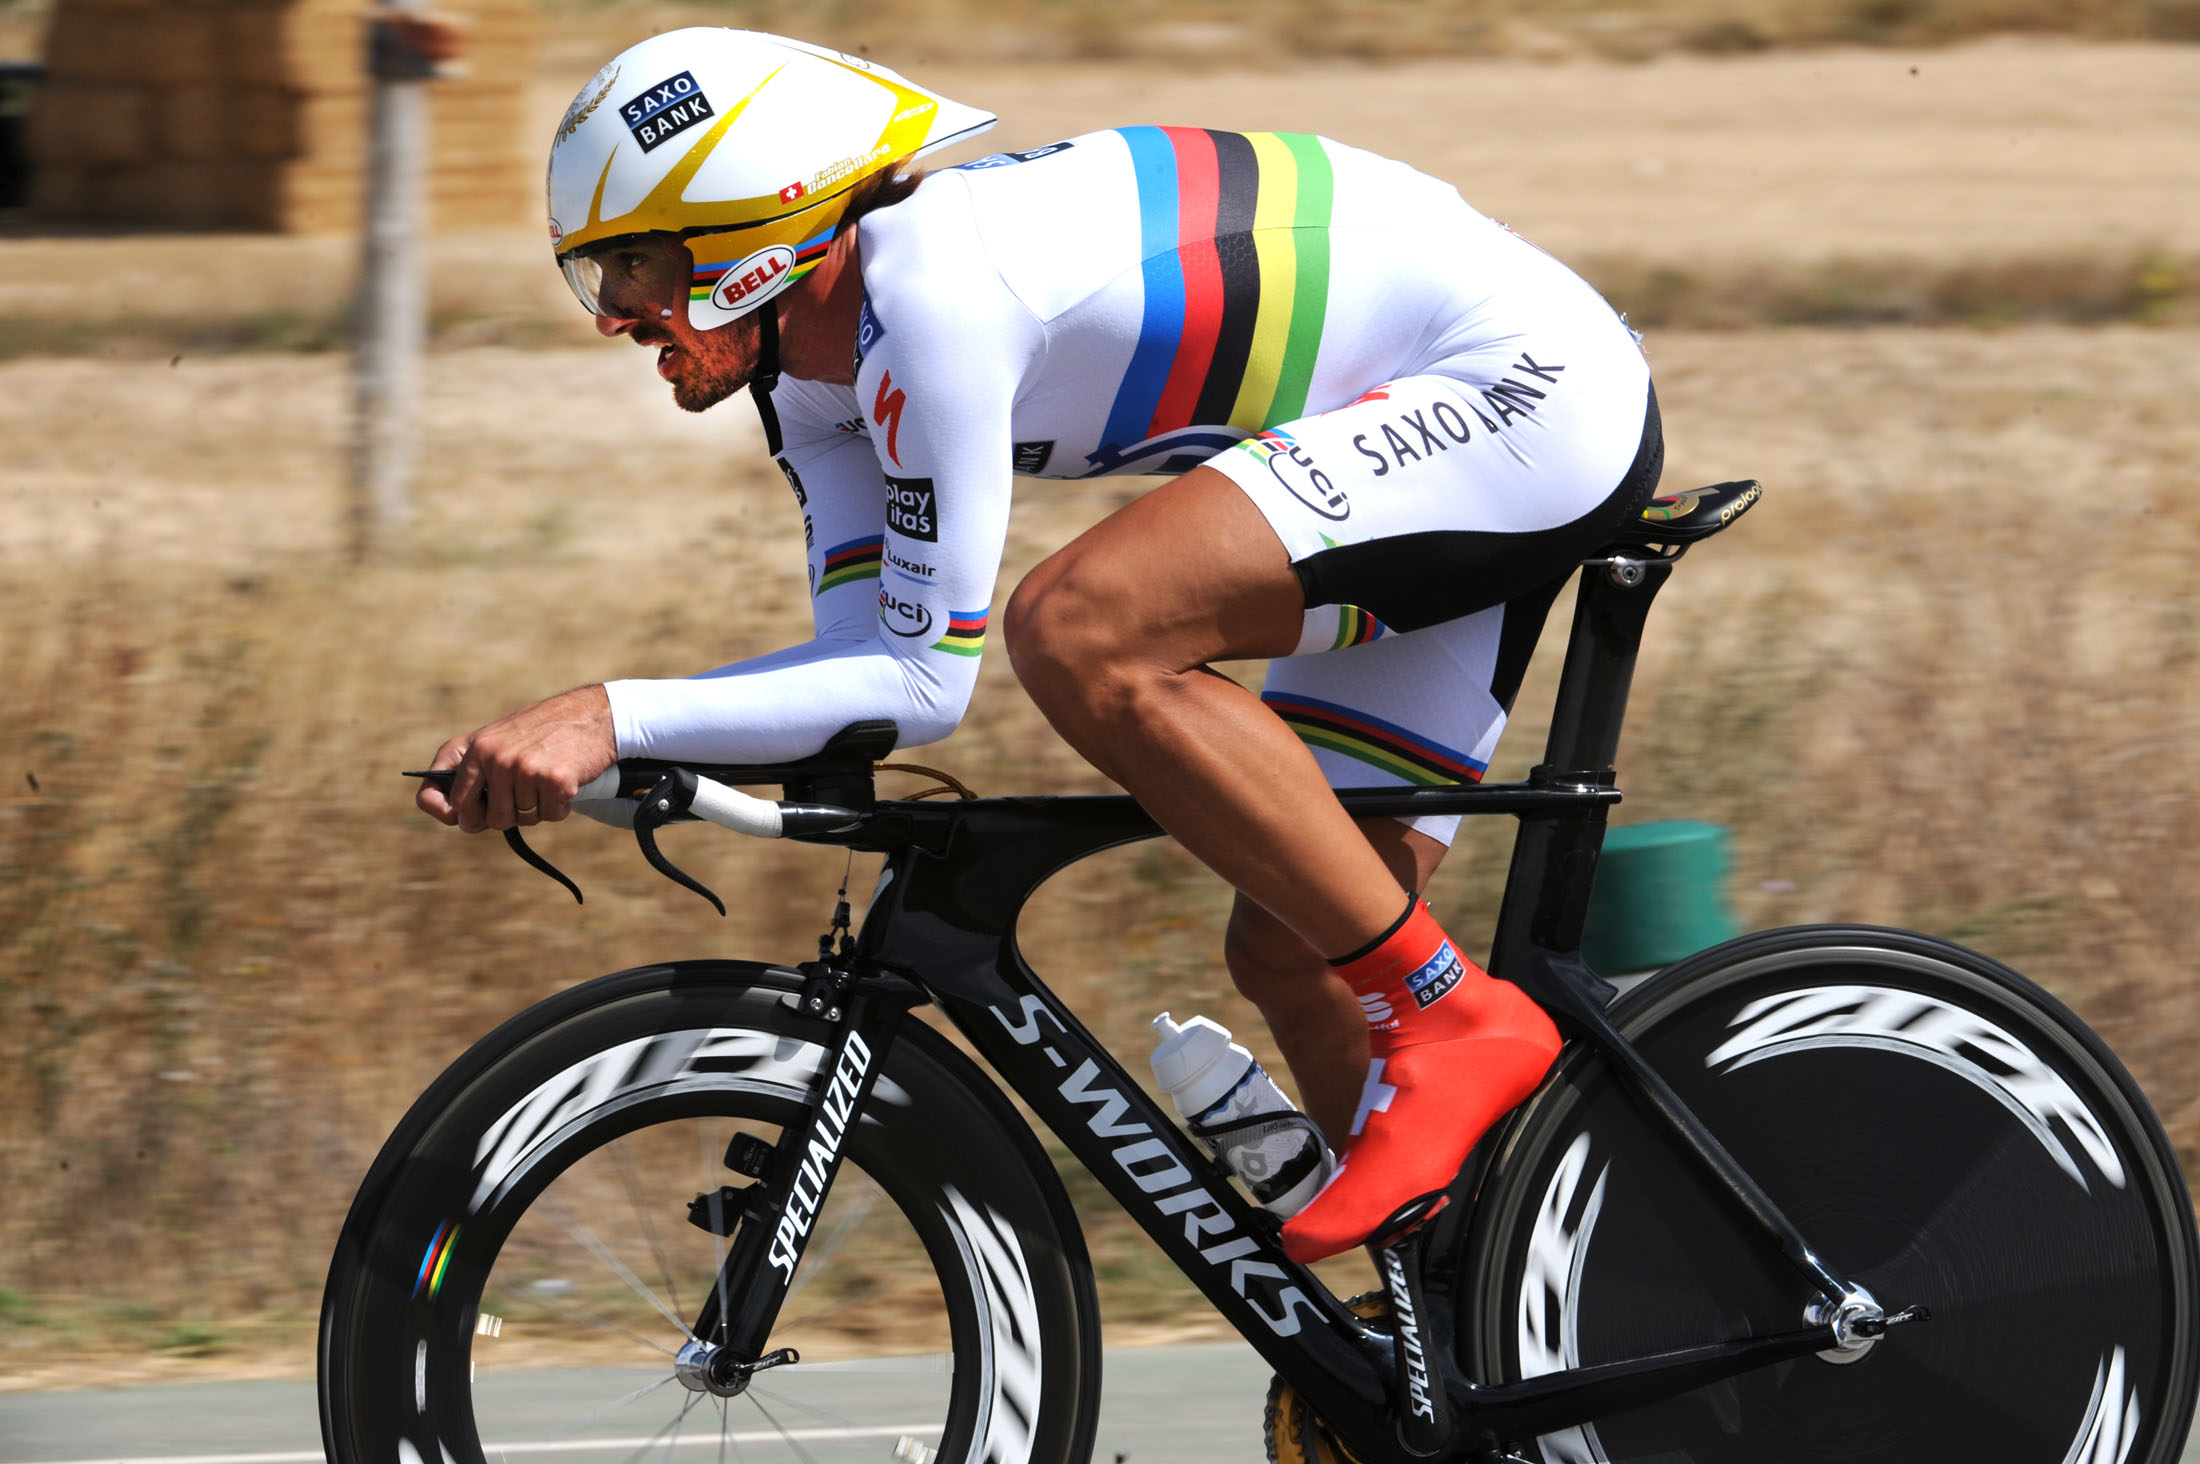 Fabian Cancellara, Vuelta a Espana 2010, stage 17 ITT